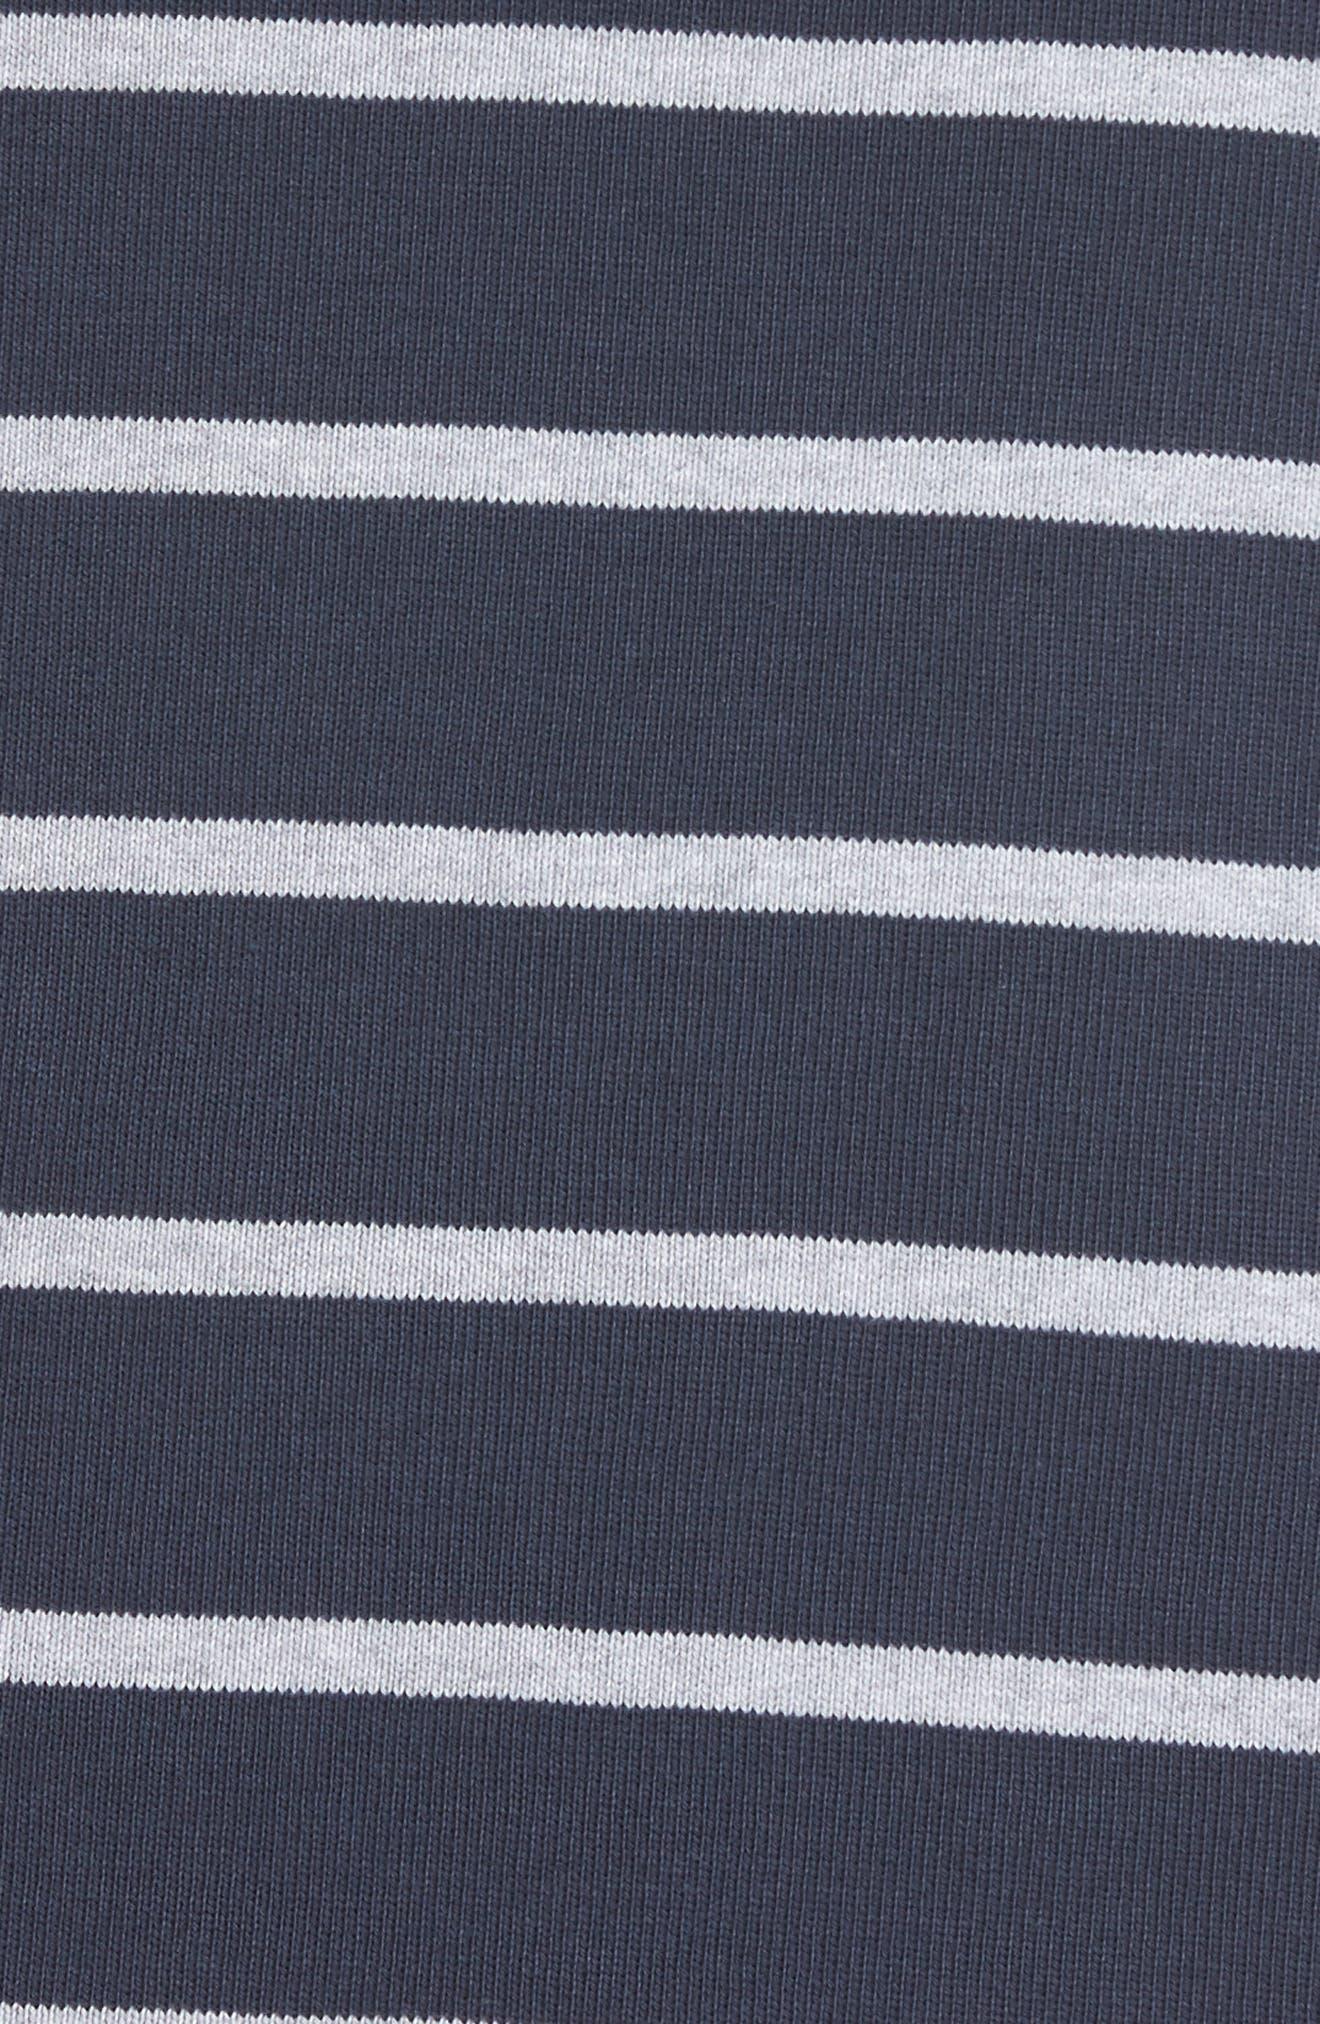 Seaburn Stripe Shift Dress,                             Alternate thumbnail 5, color,                             Navy